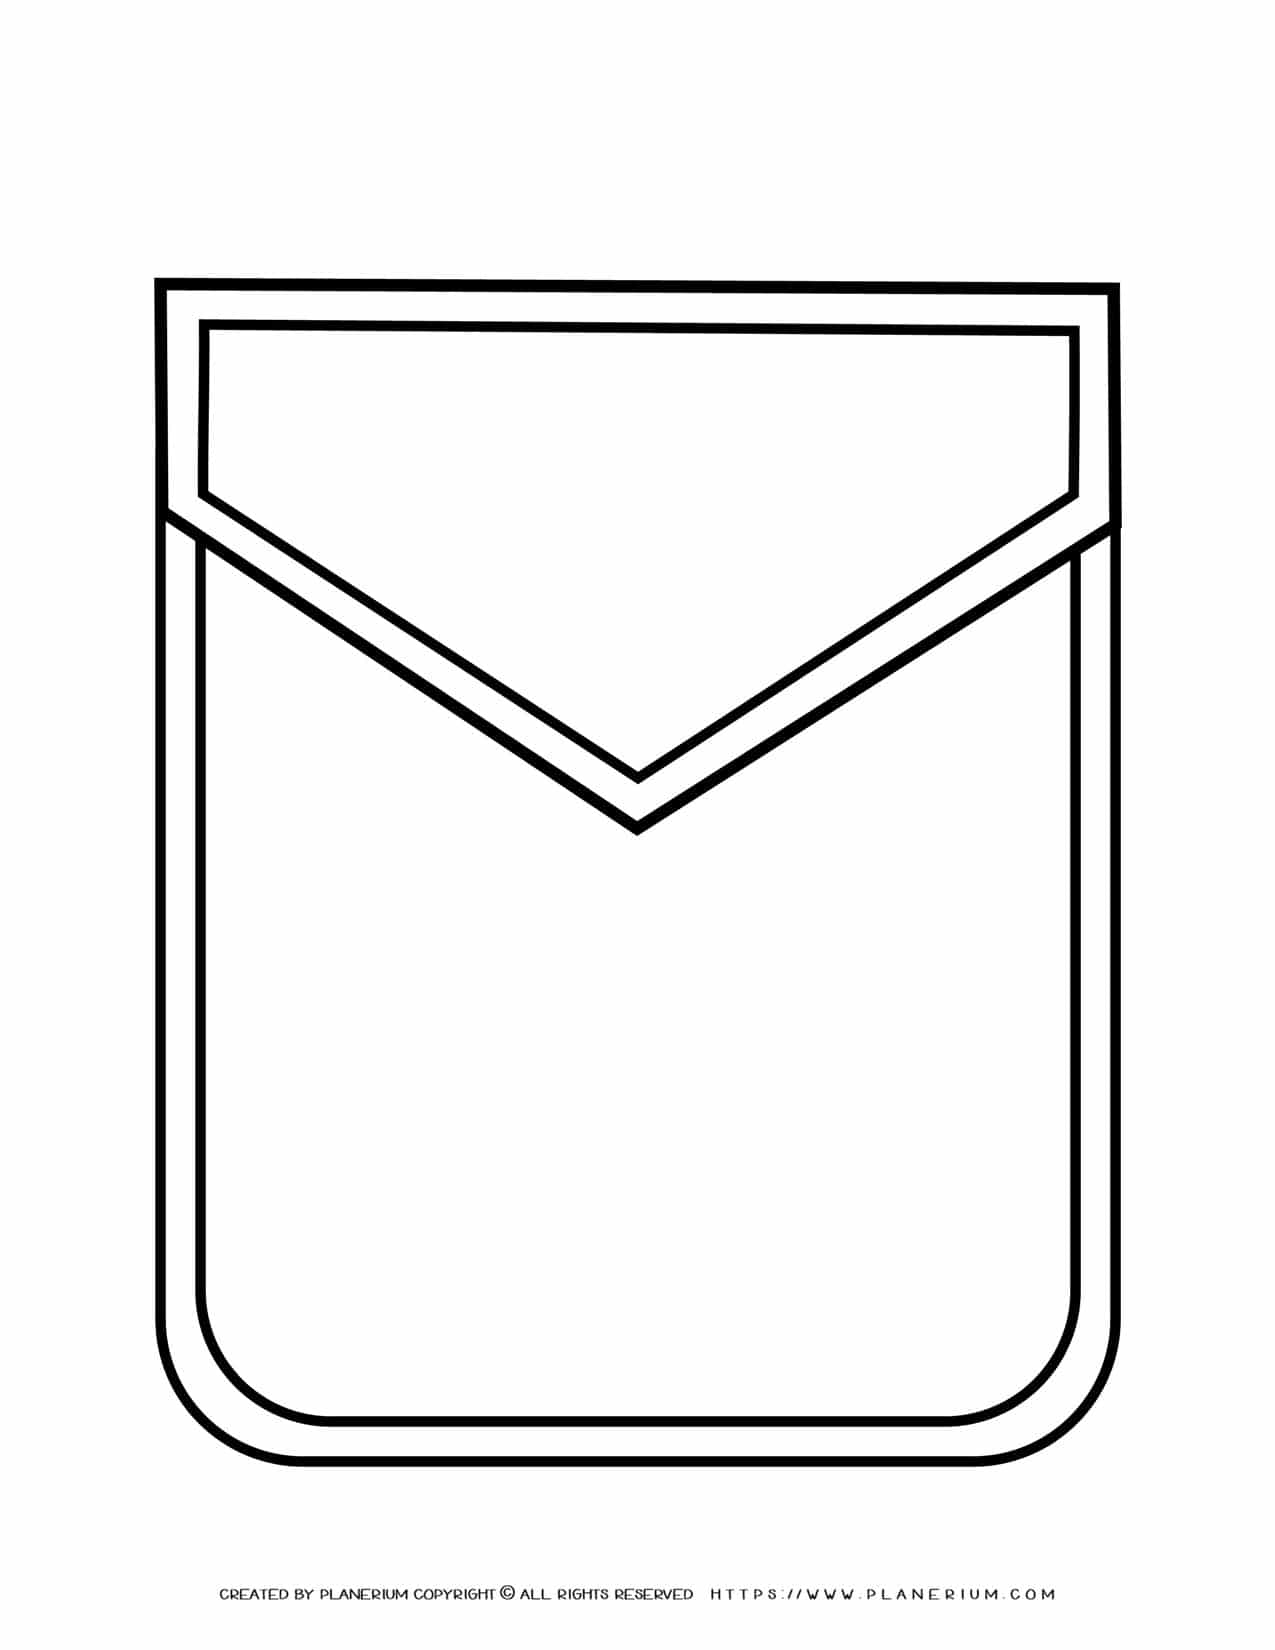 Pocket Template   Planerium